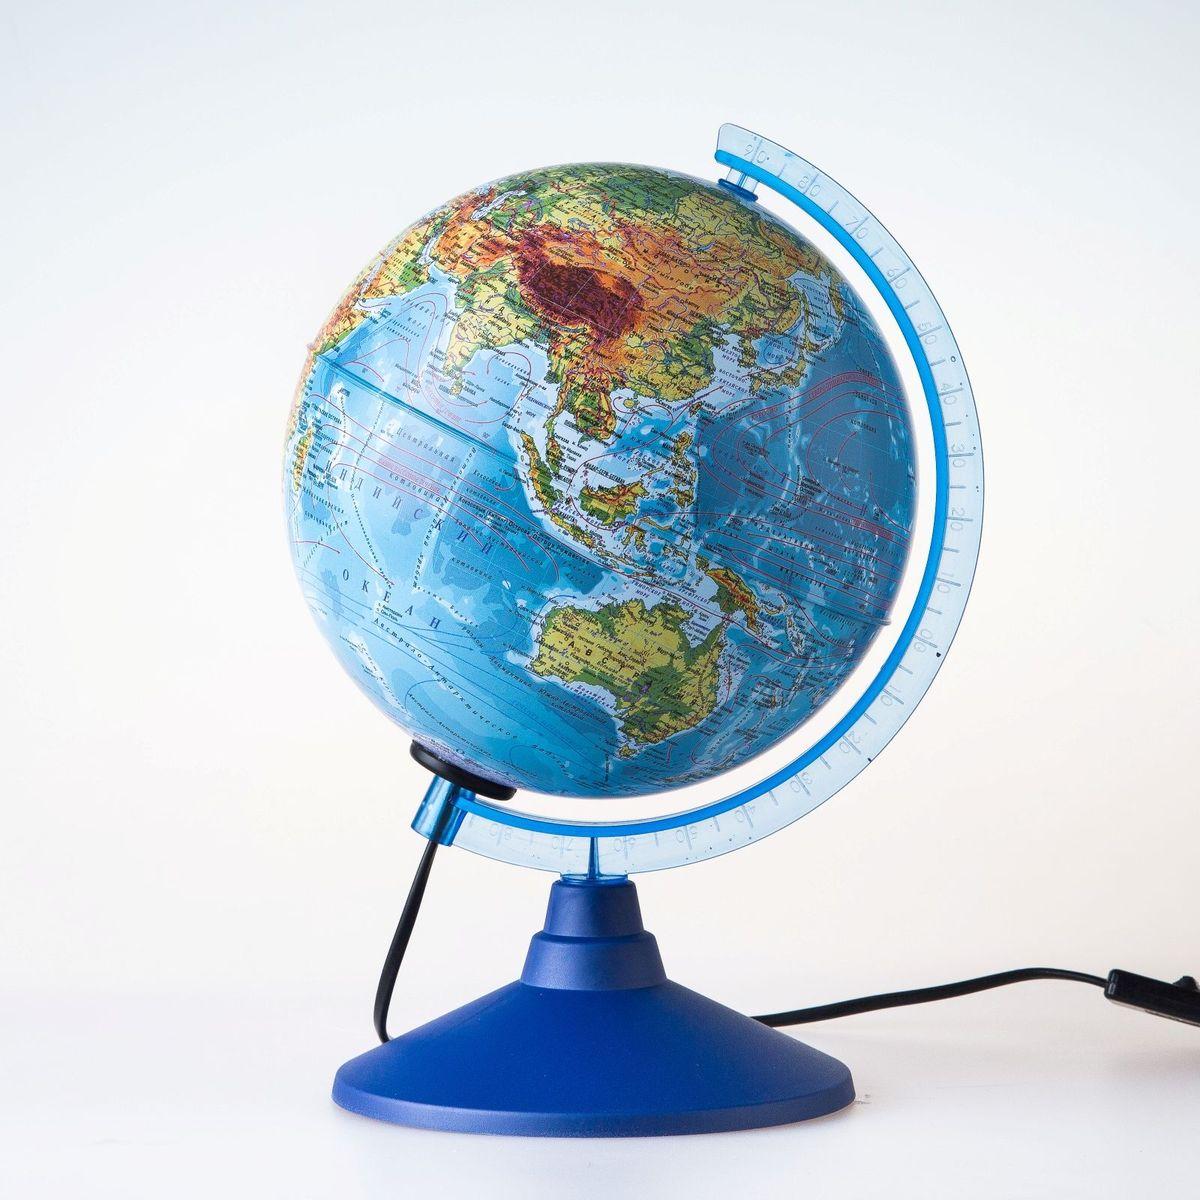 Глобен Глобус физический Классик Евро диаметр 15 см -  Глобусы